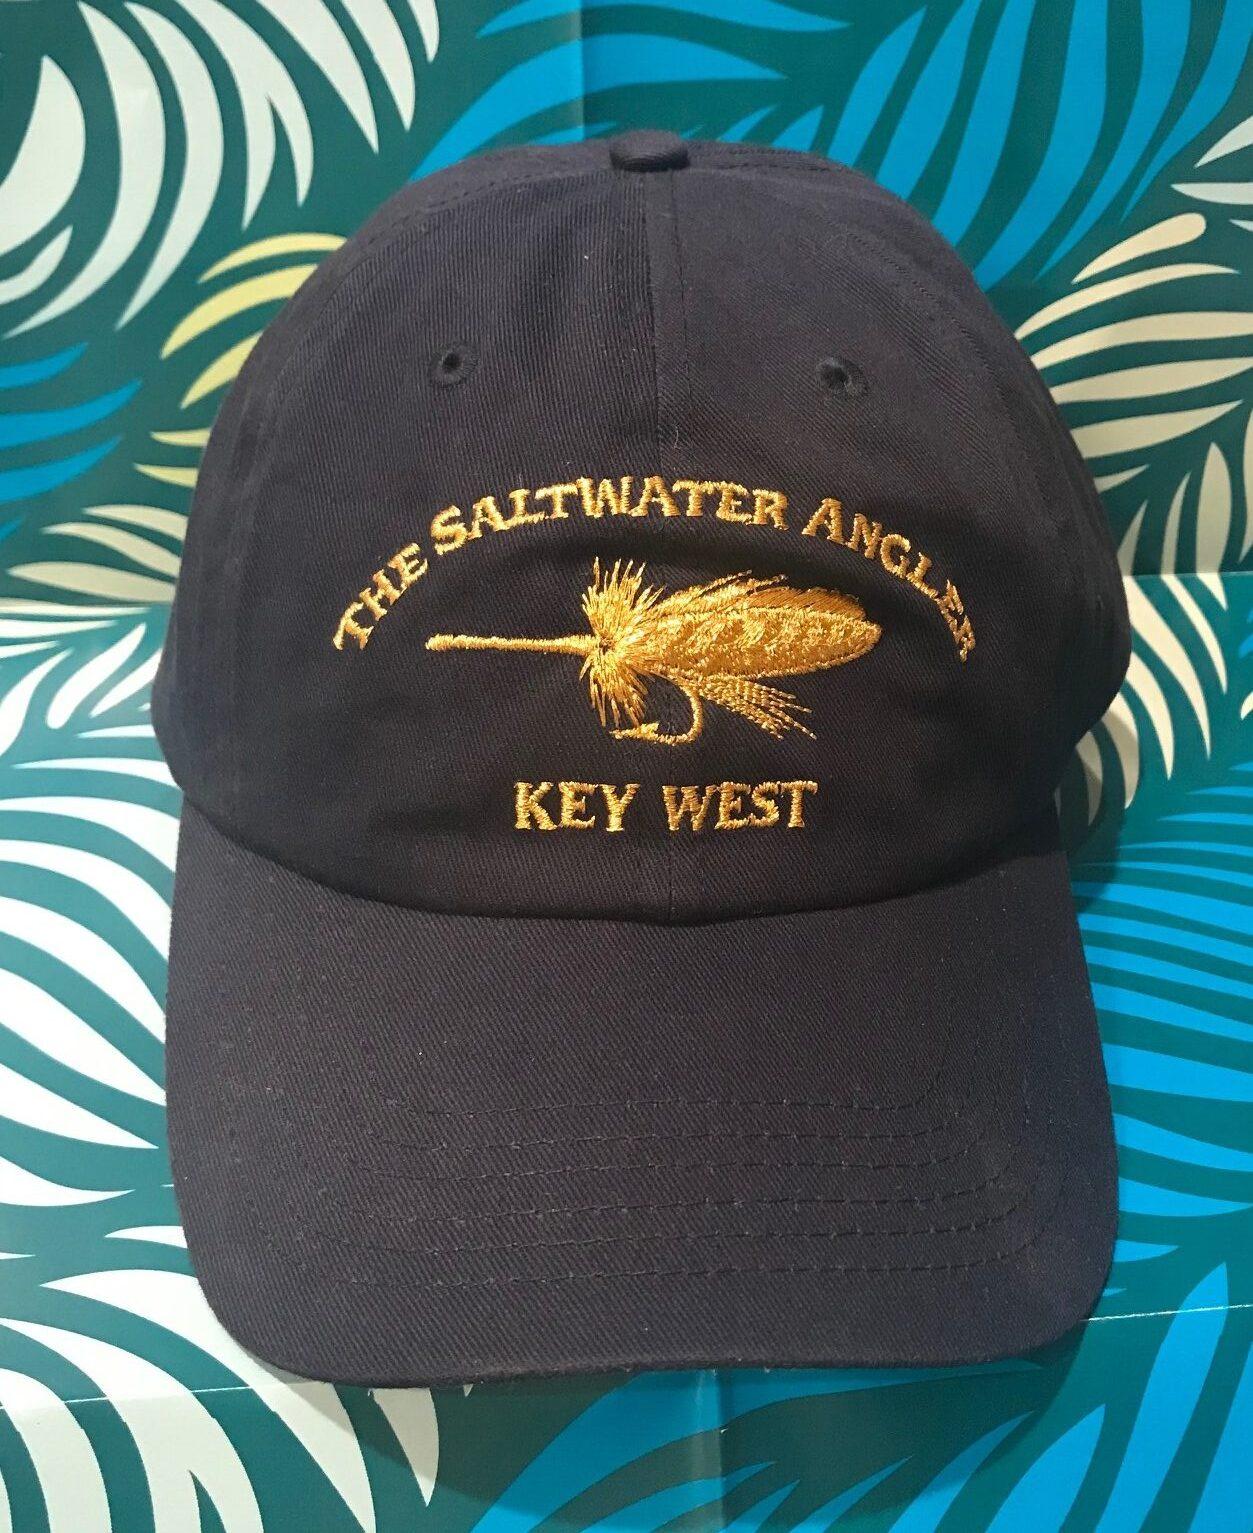 Saltwater Angler Cotton Cap